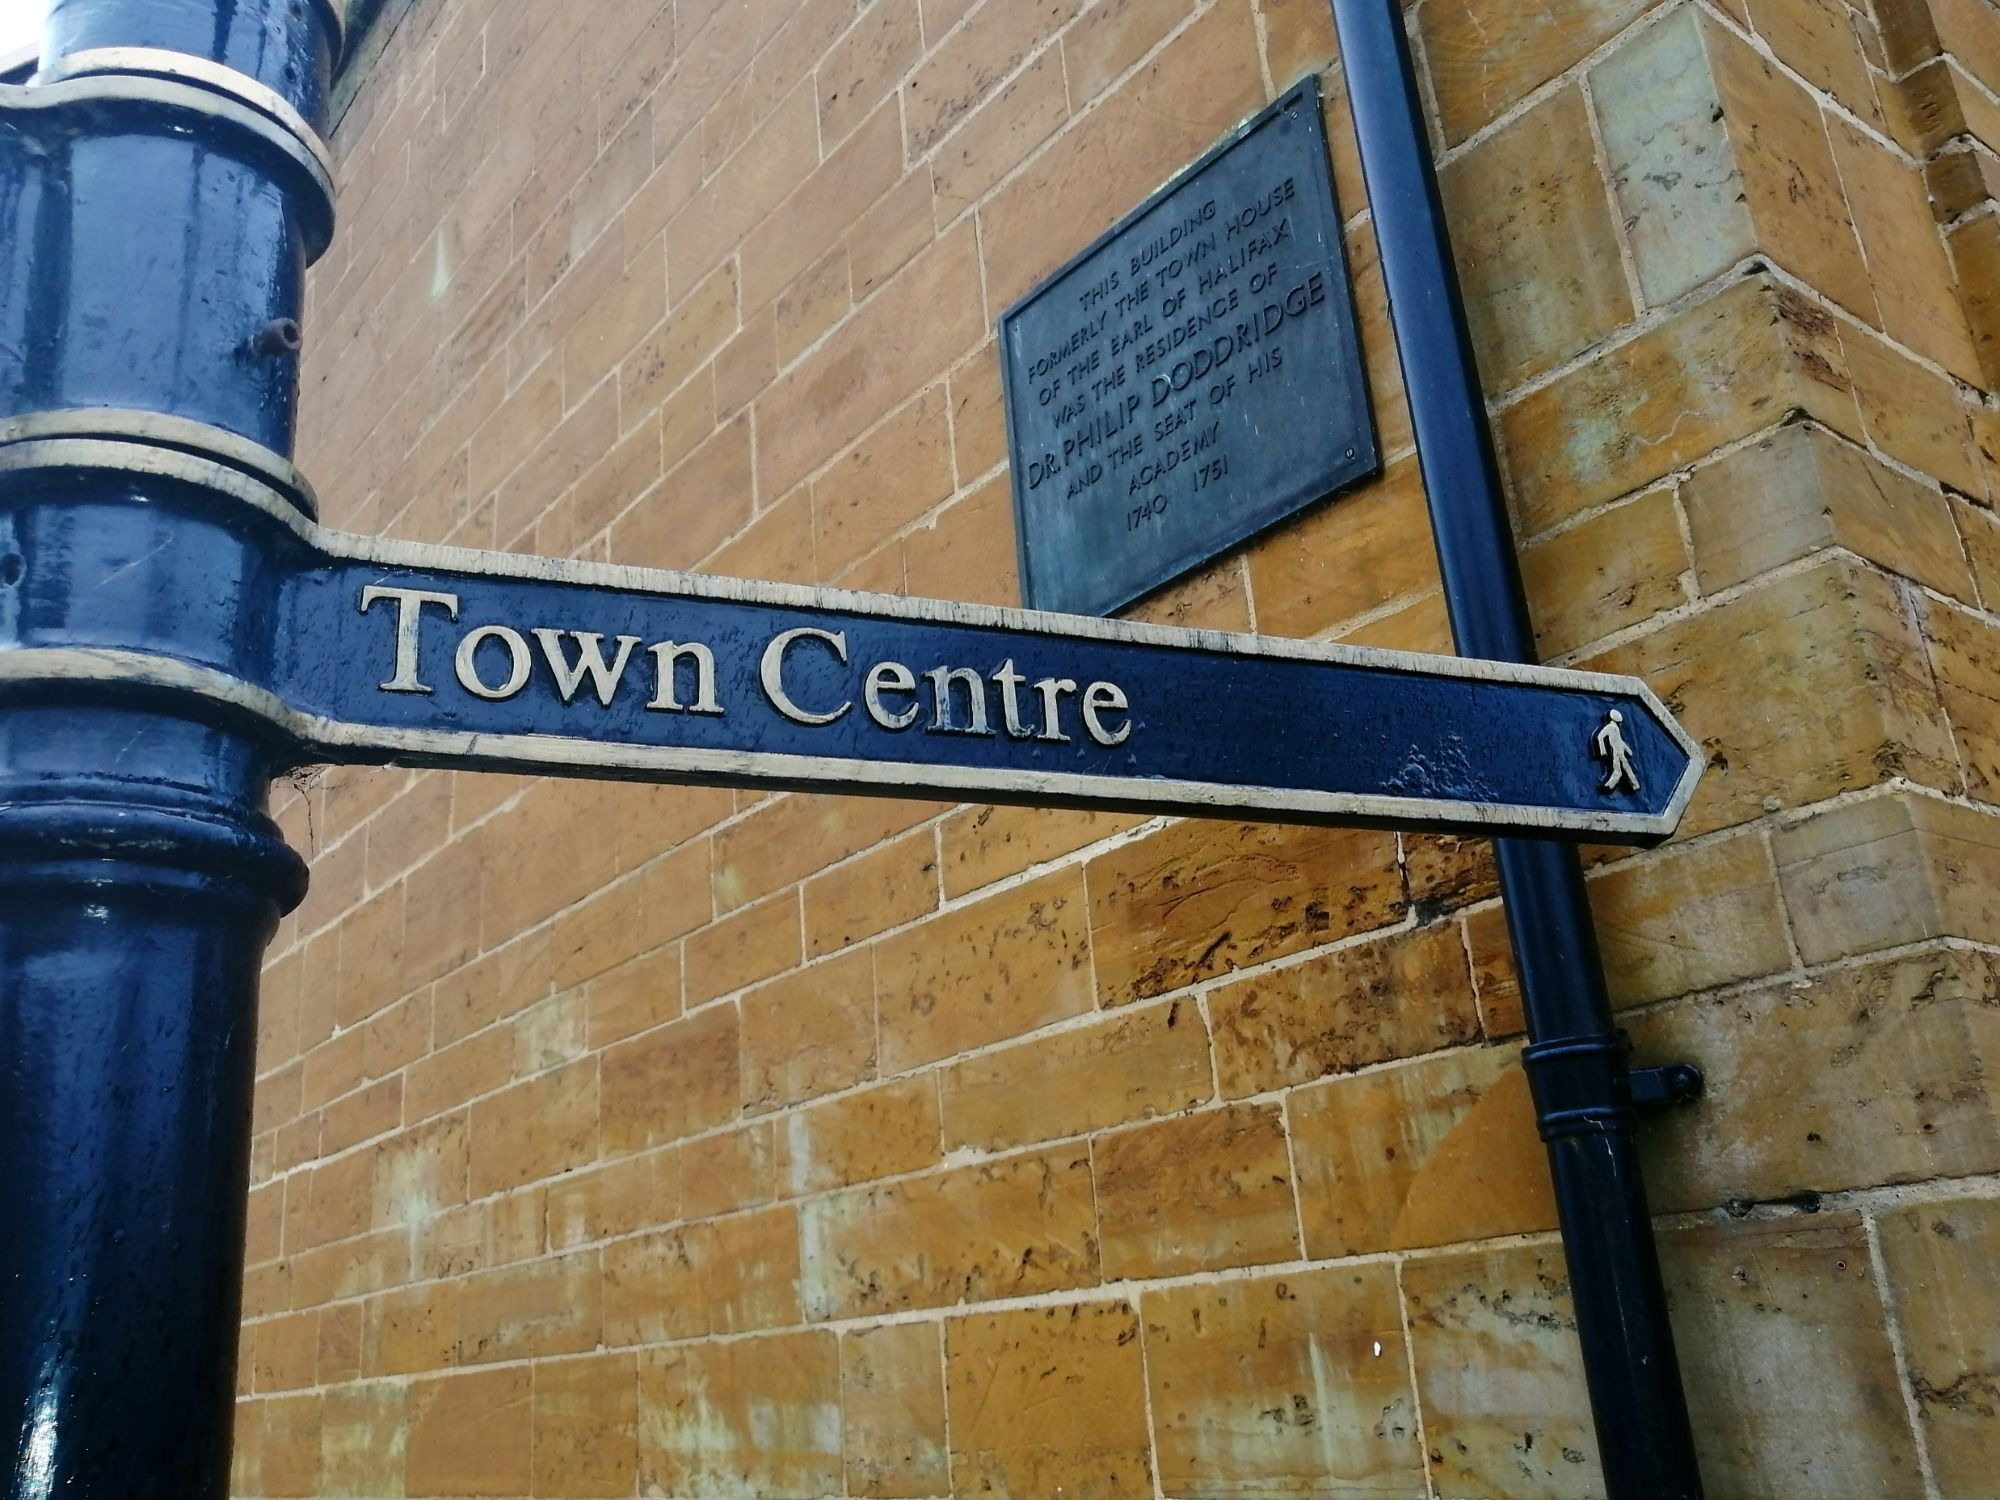 northamptontowncentre-1614445081.jpg